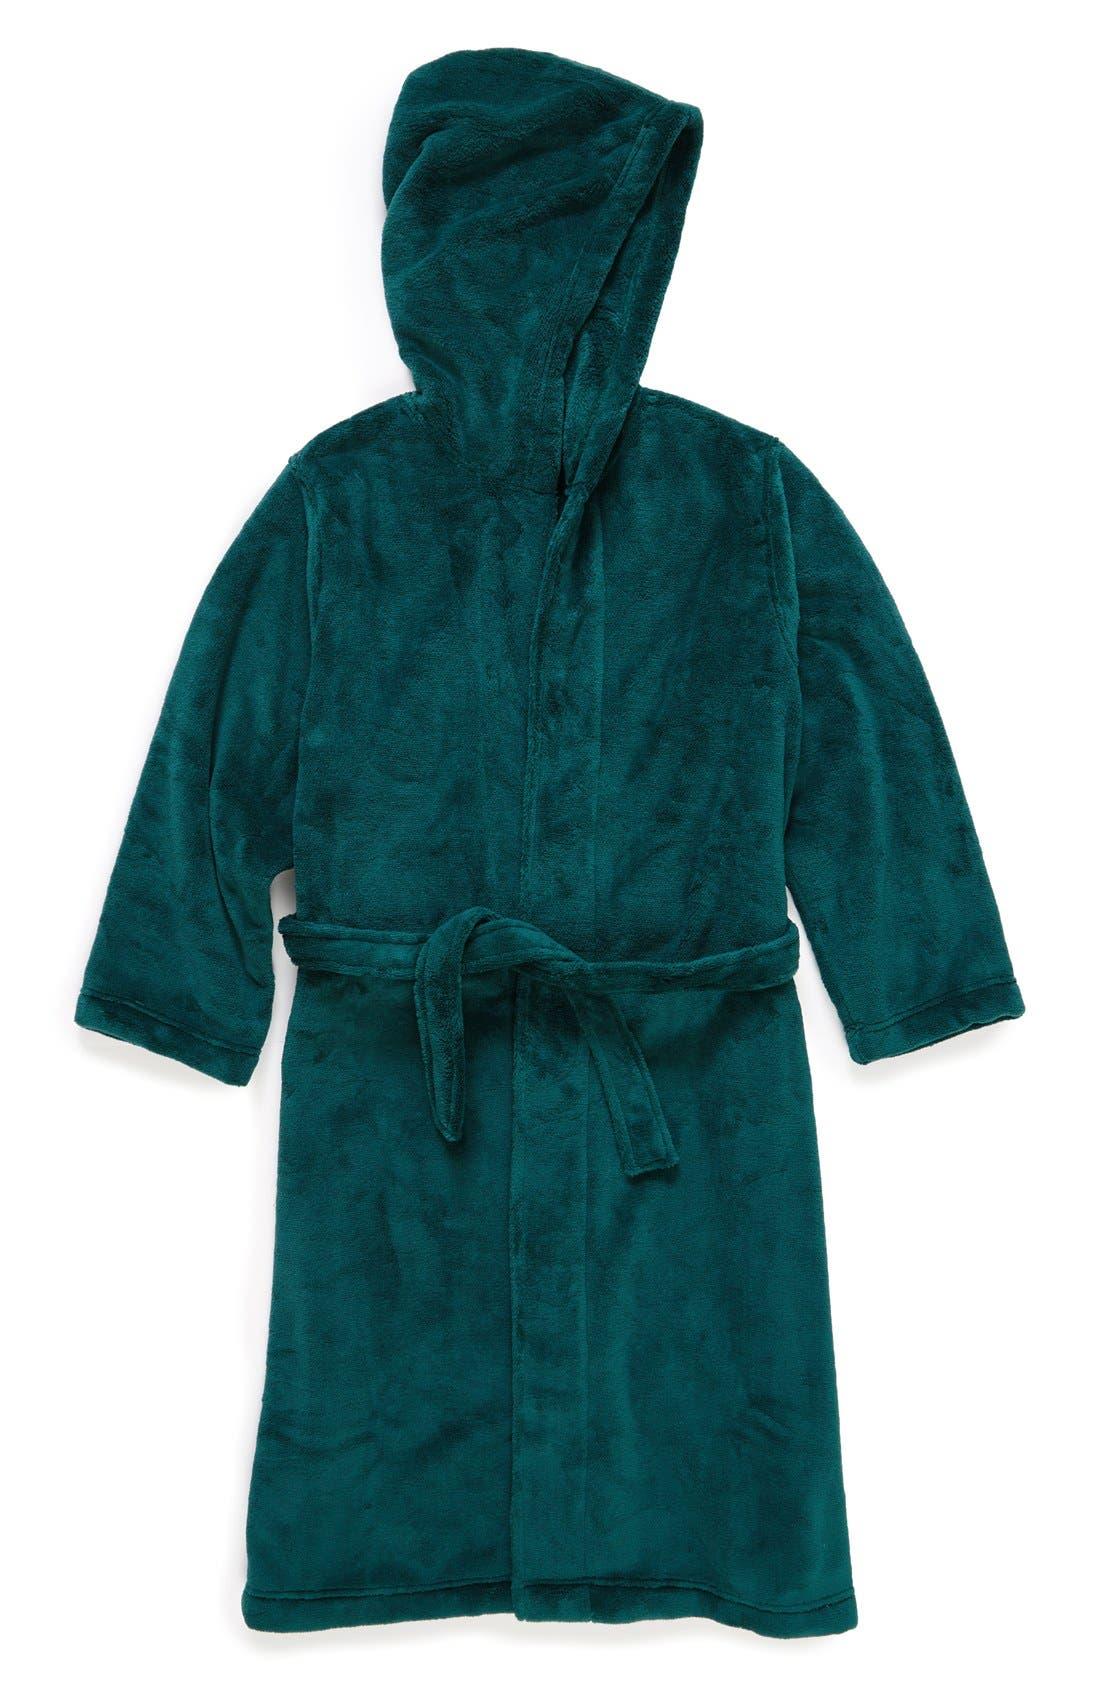 Main Image - Tucker + Tate Hooded Fleece Robe (Toddler, Little Kids & Big Kids)